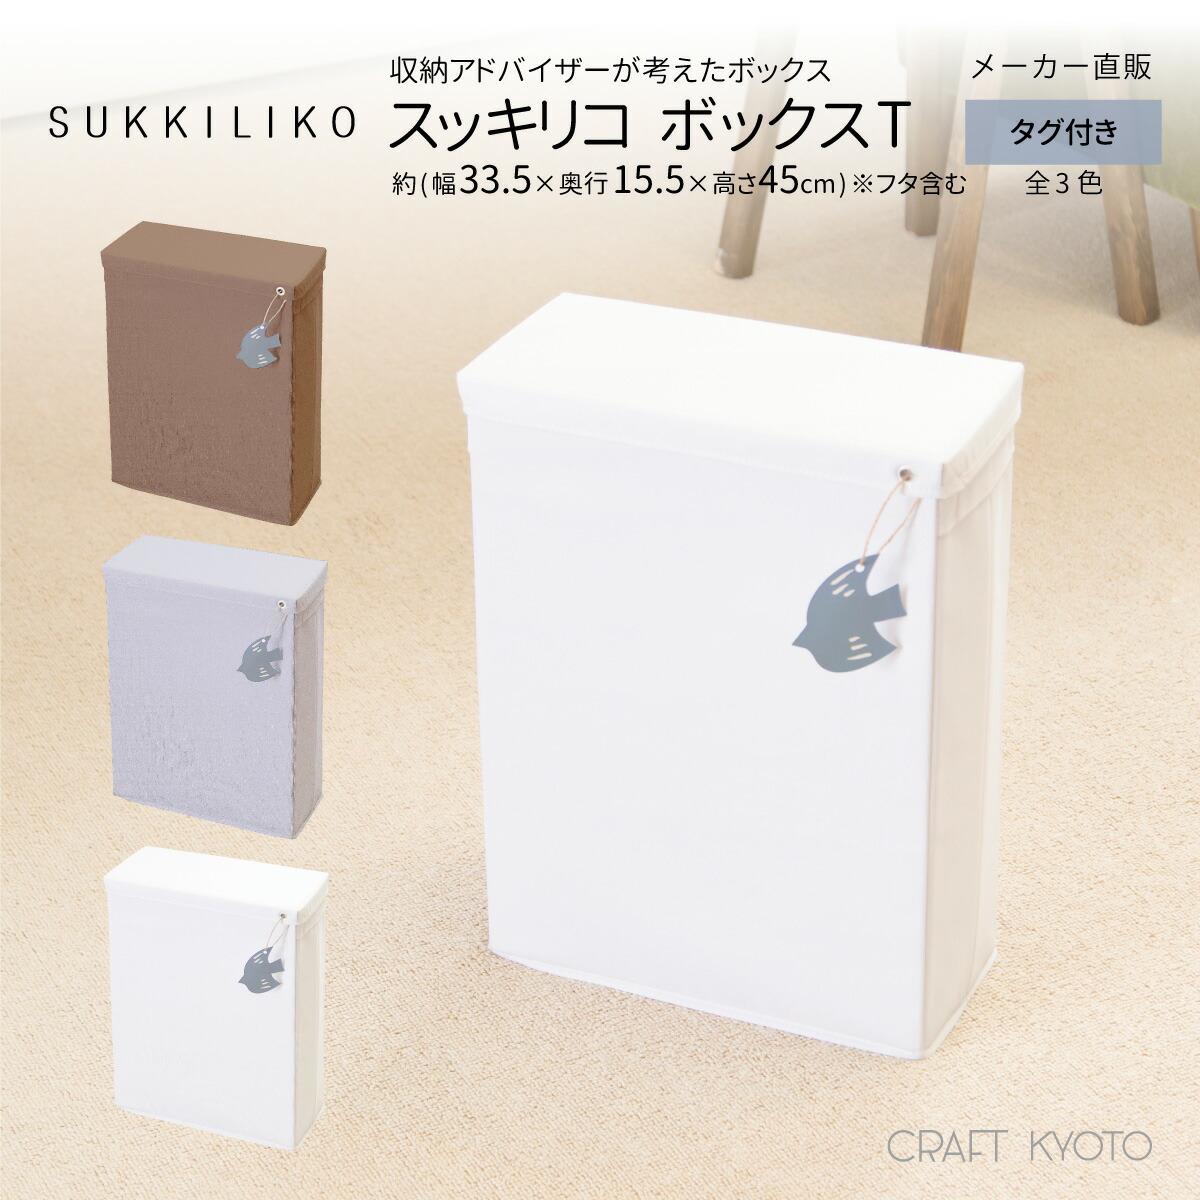 SUKKILIKO スッキリコ ボックス 縦サイズ